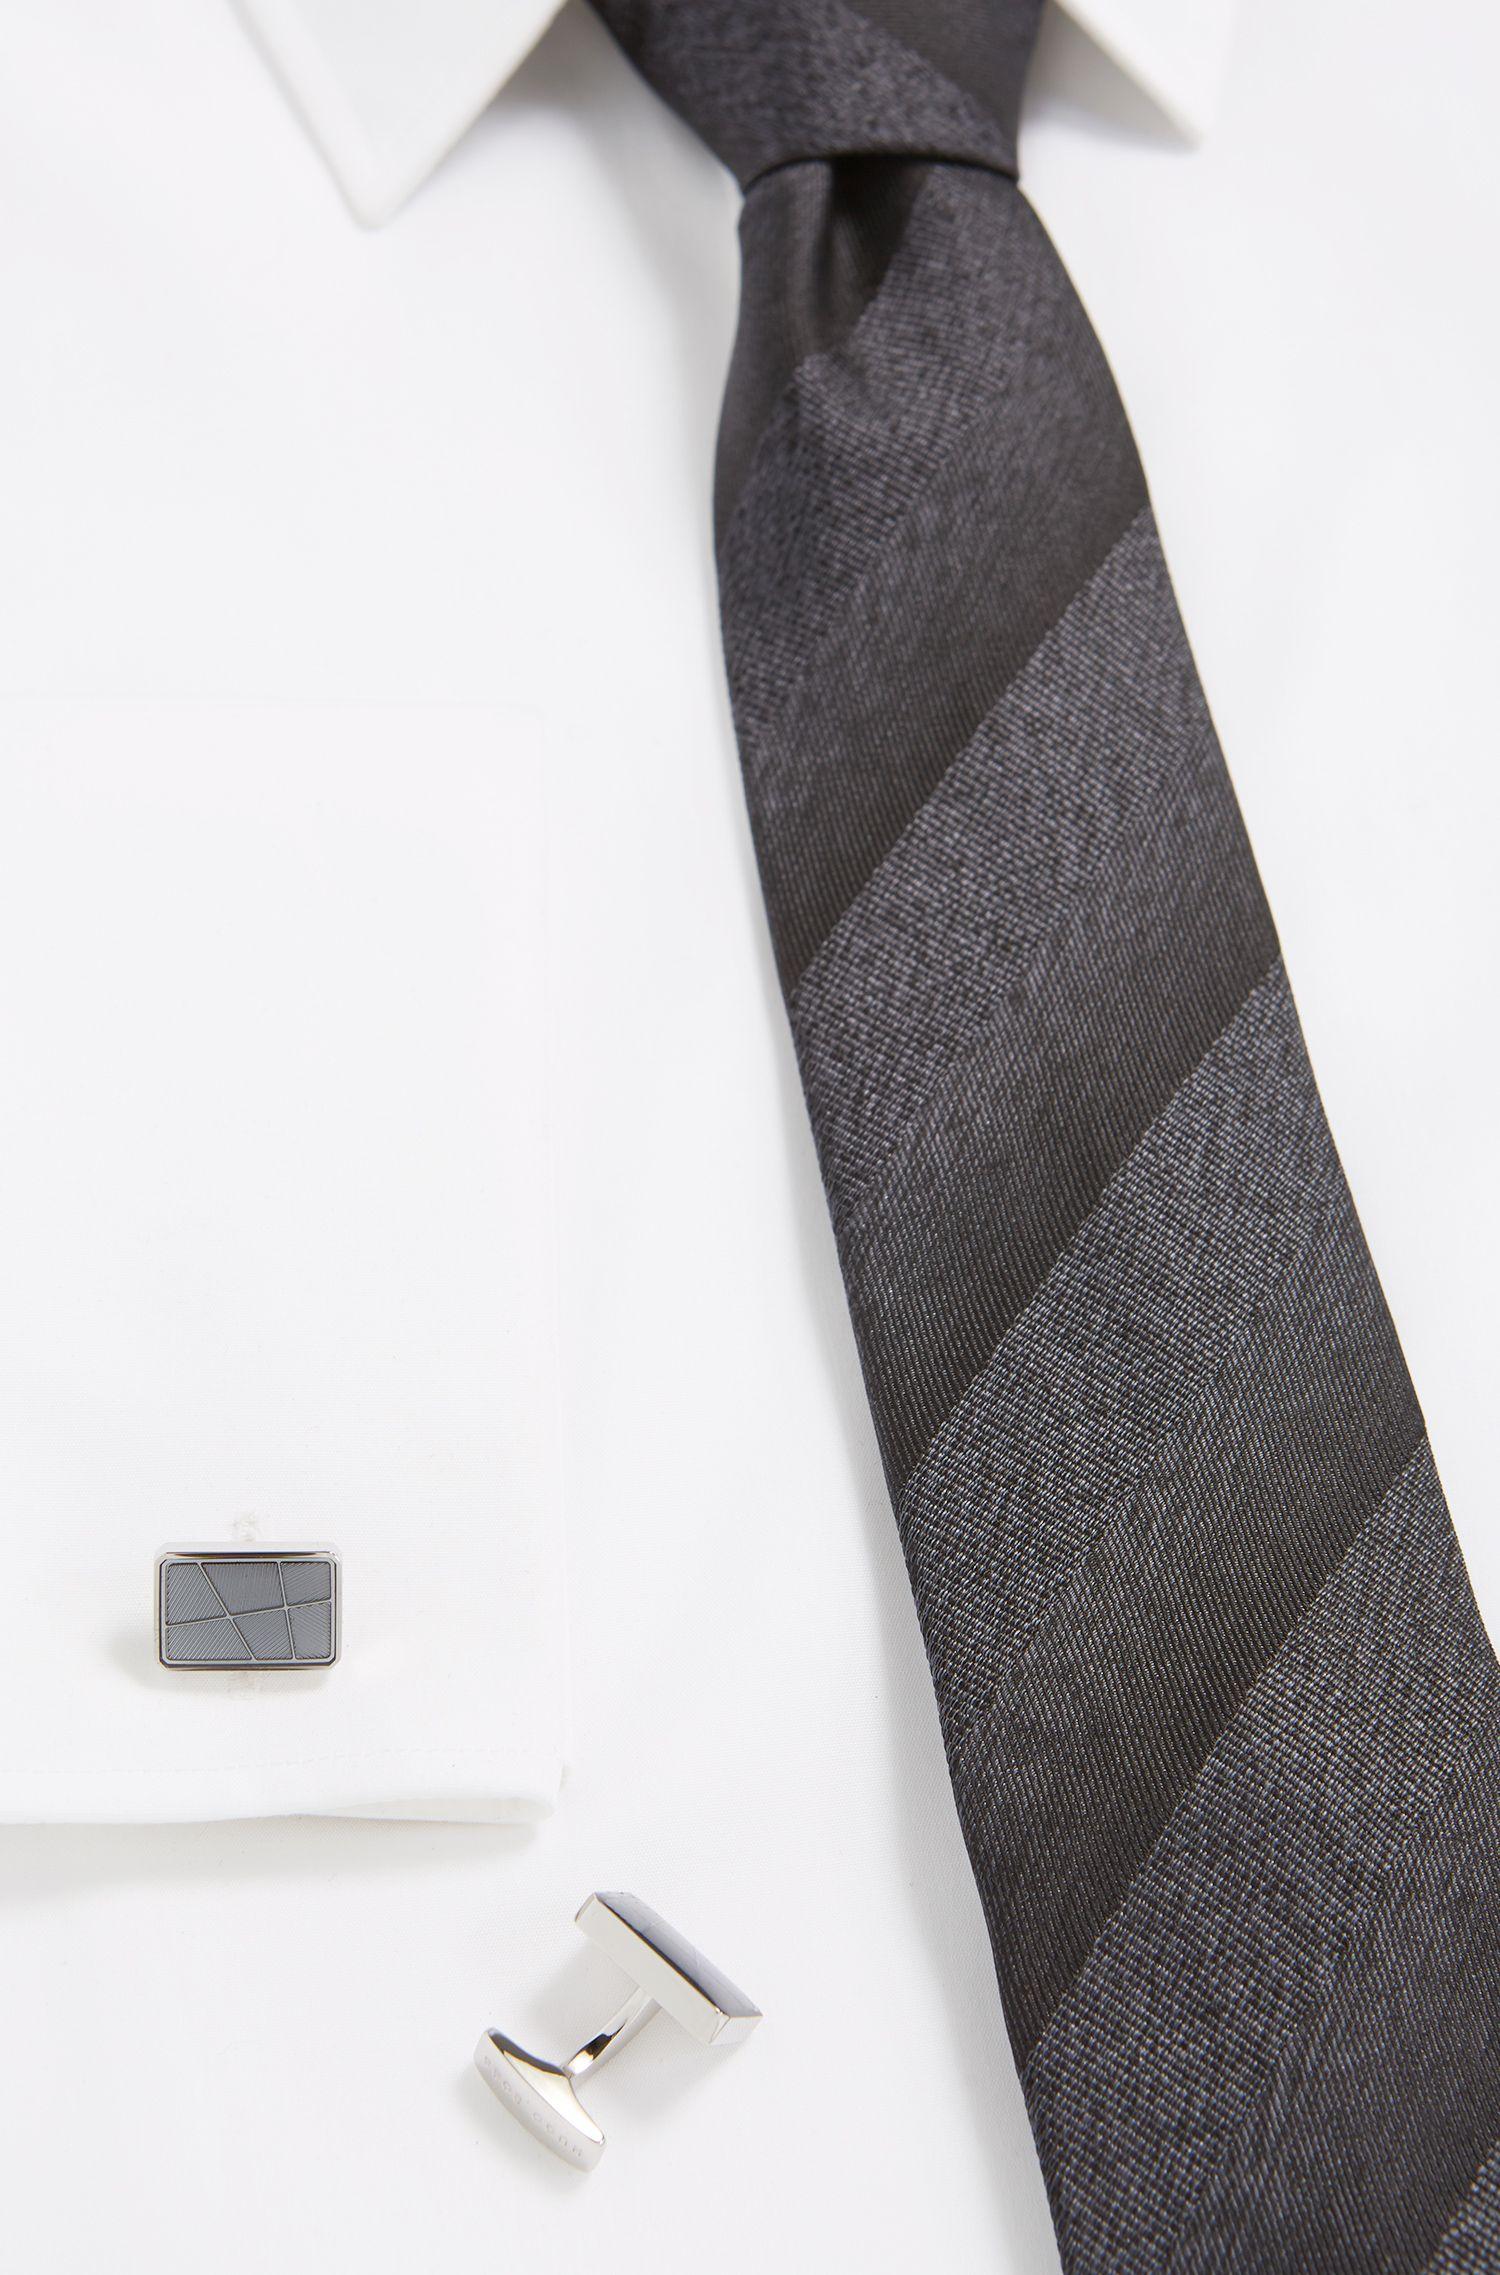 'Rodge' | Brass Etched Cufflinks